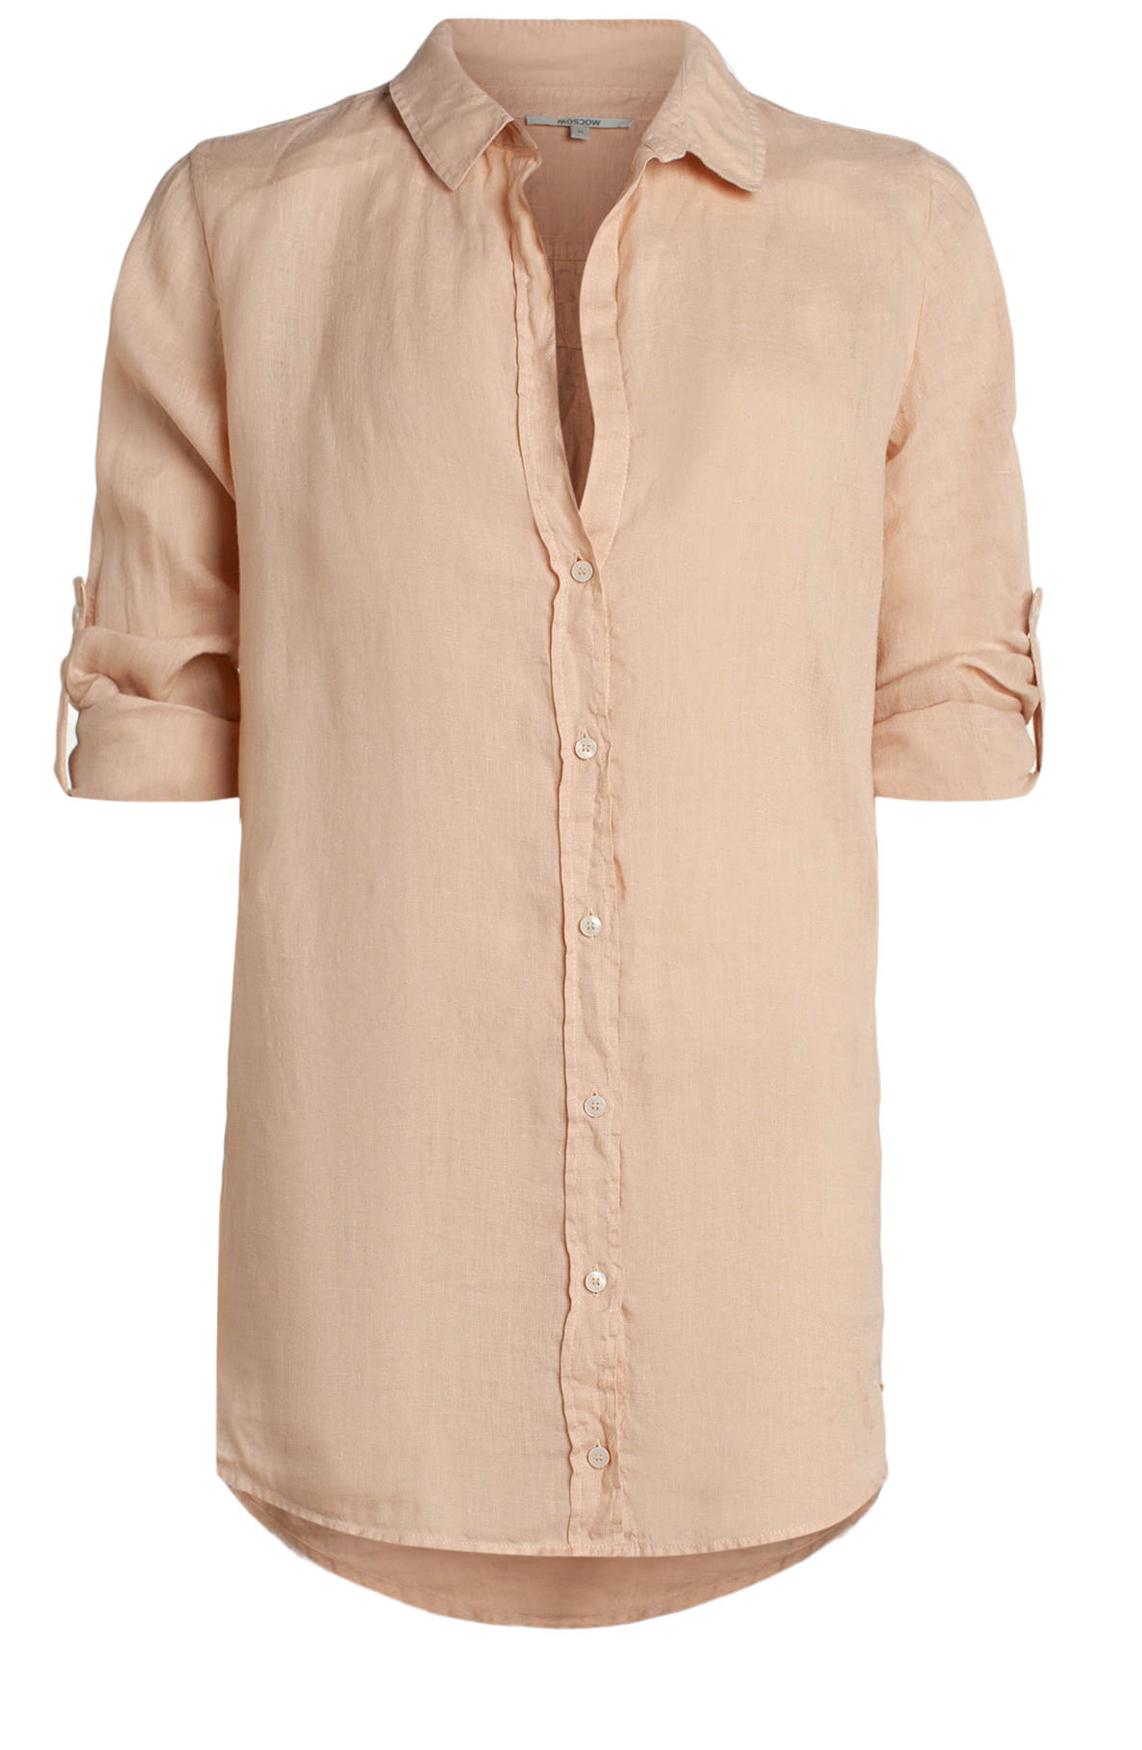 Moscow Dames Linnen blouse roze